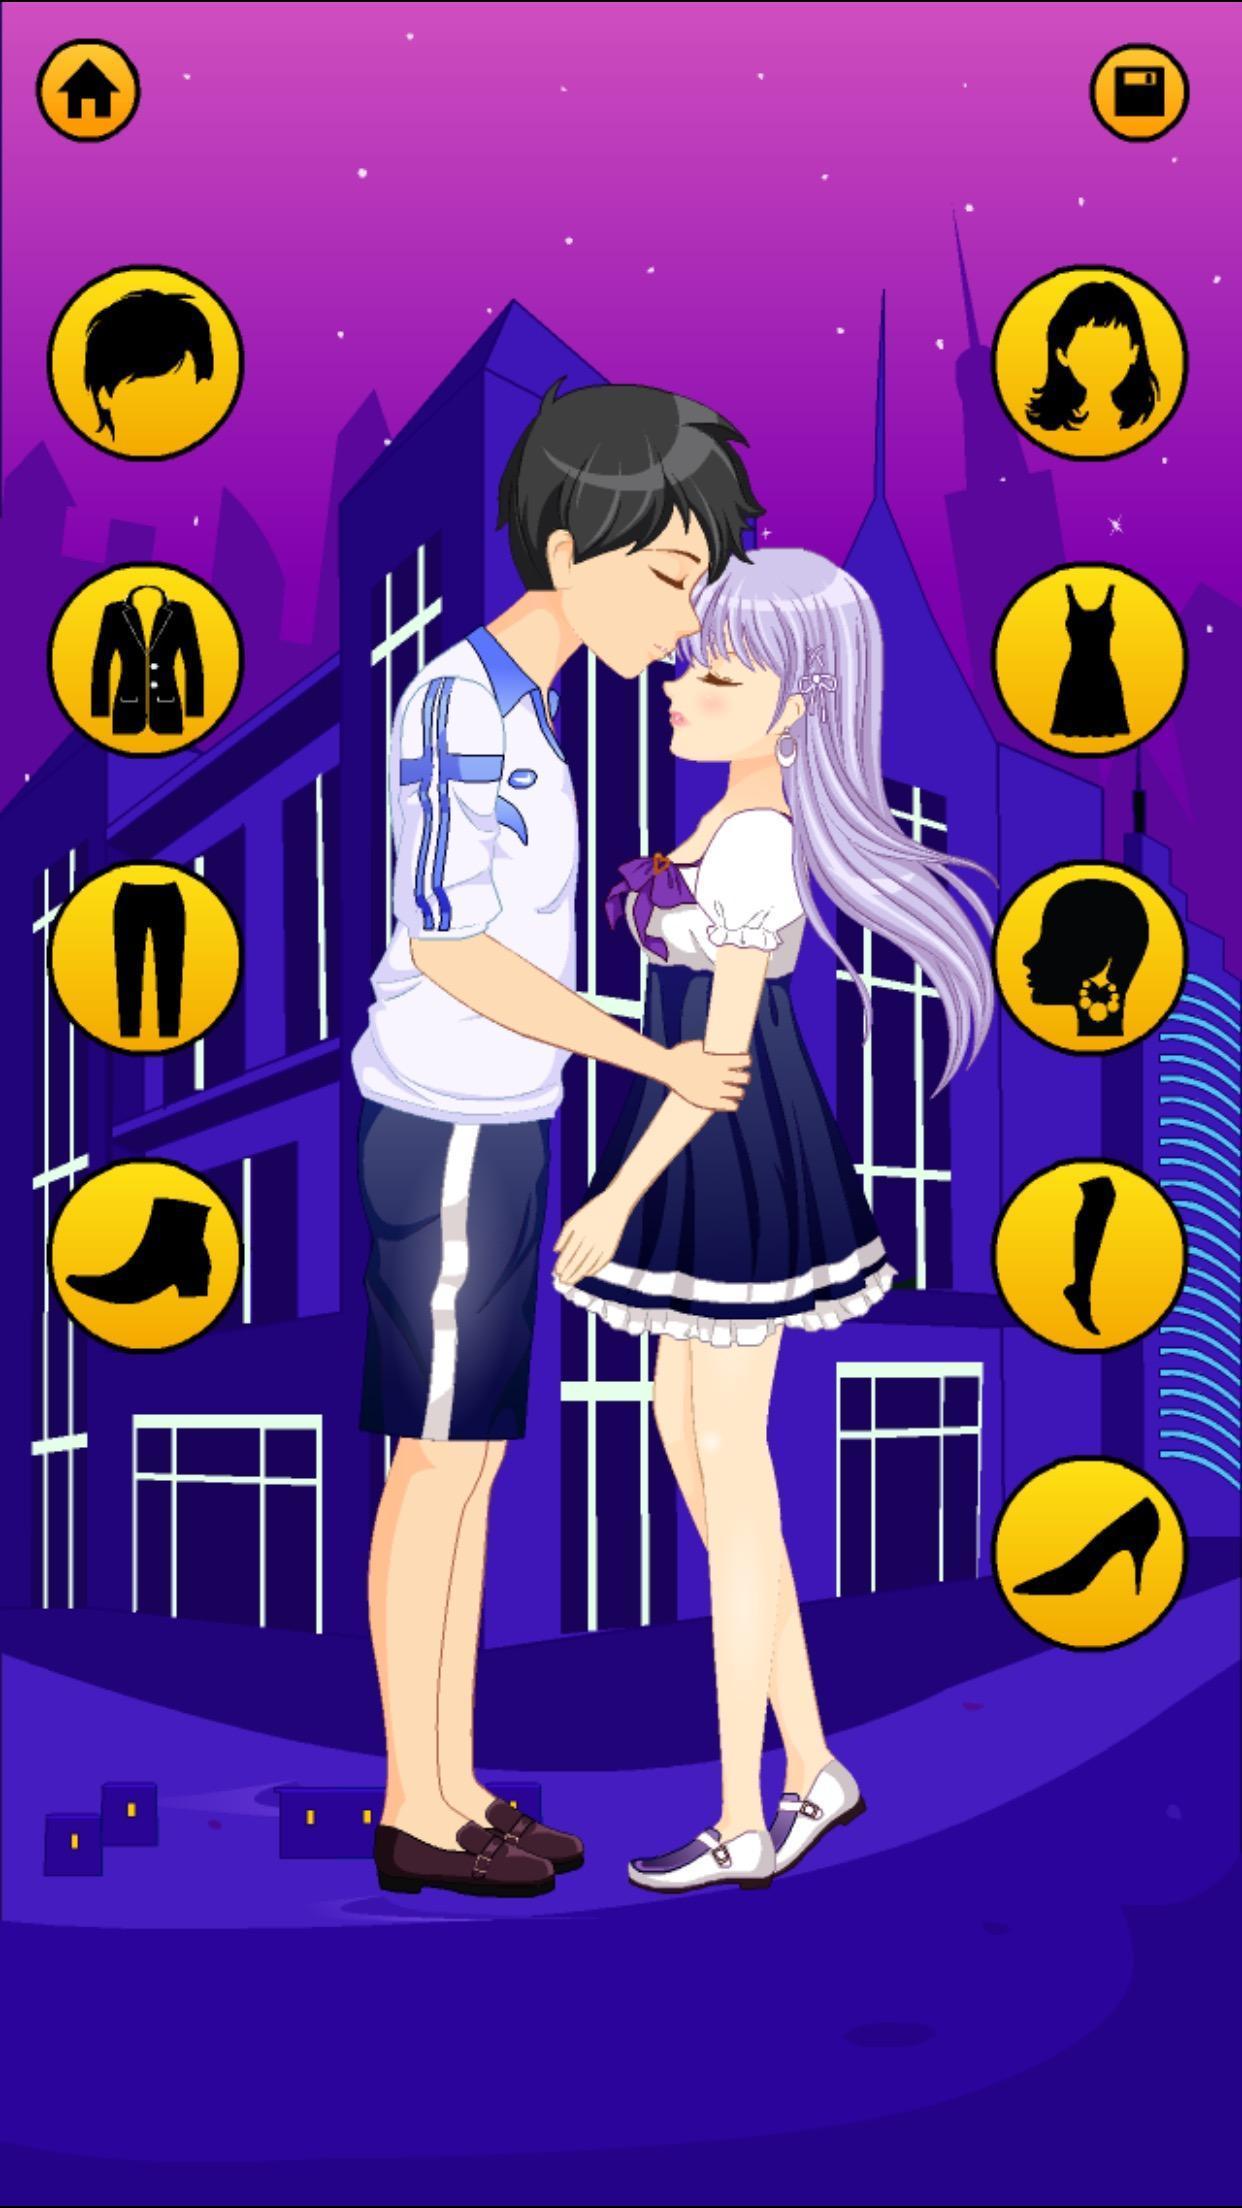 Anime Dress Up Games For Girls - Couple Love Kiss 3.3 Screenshot 3